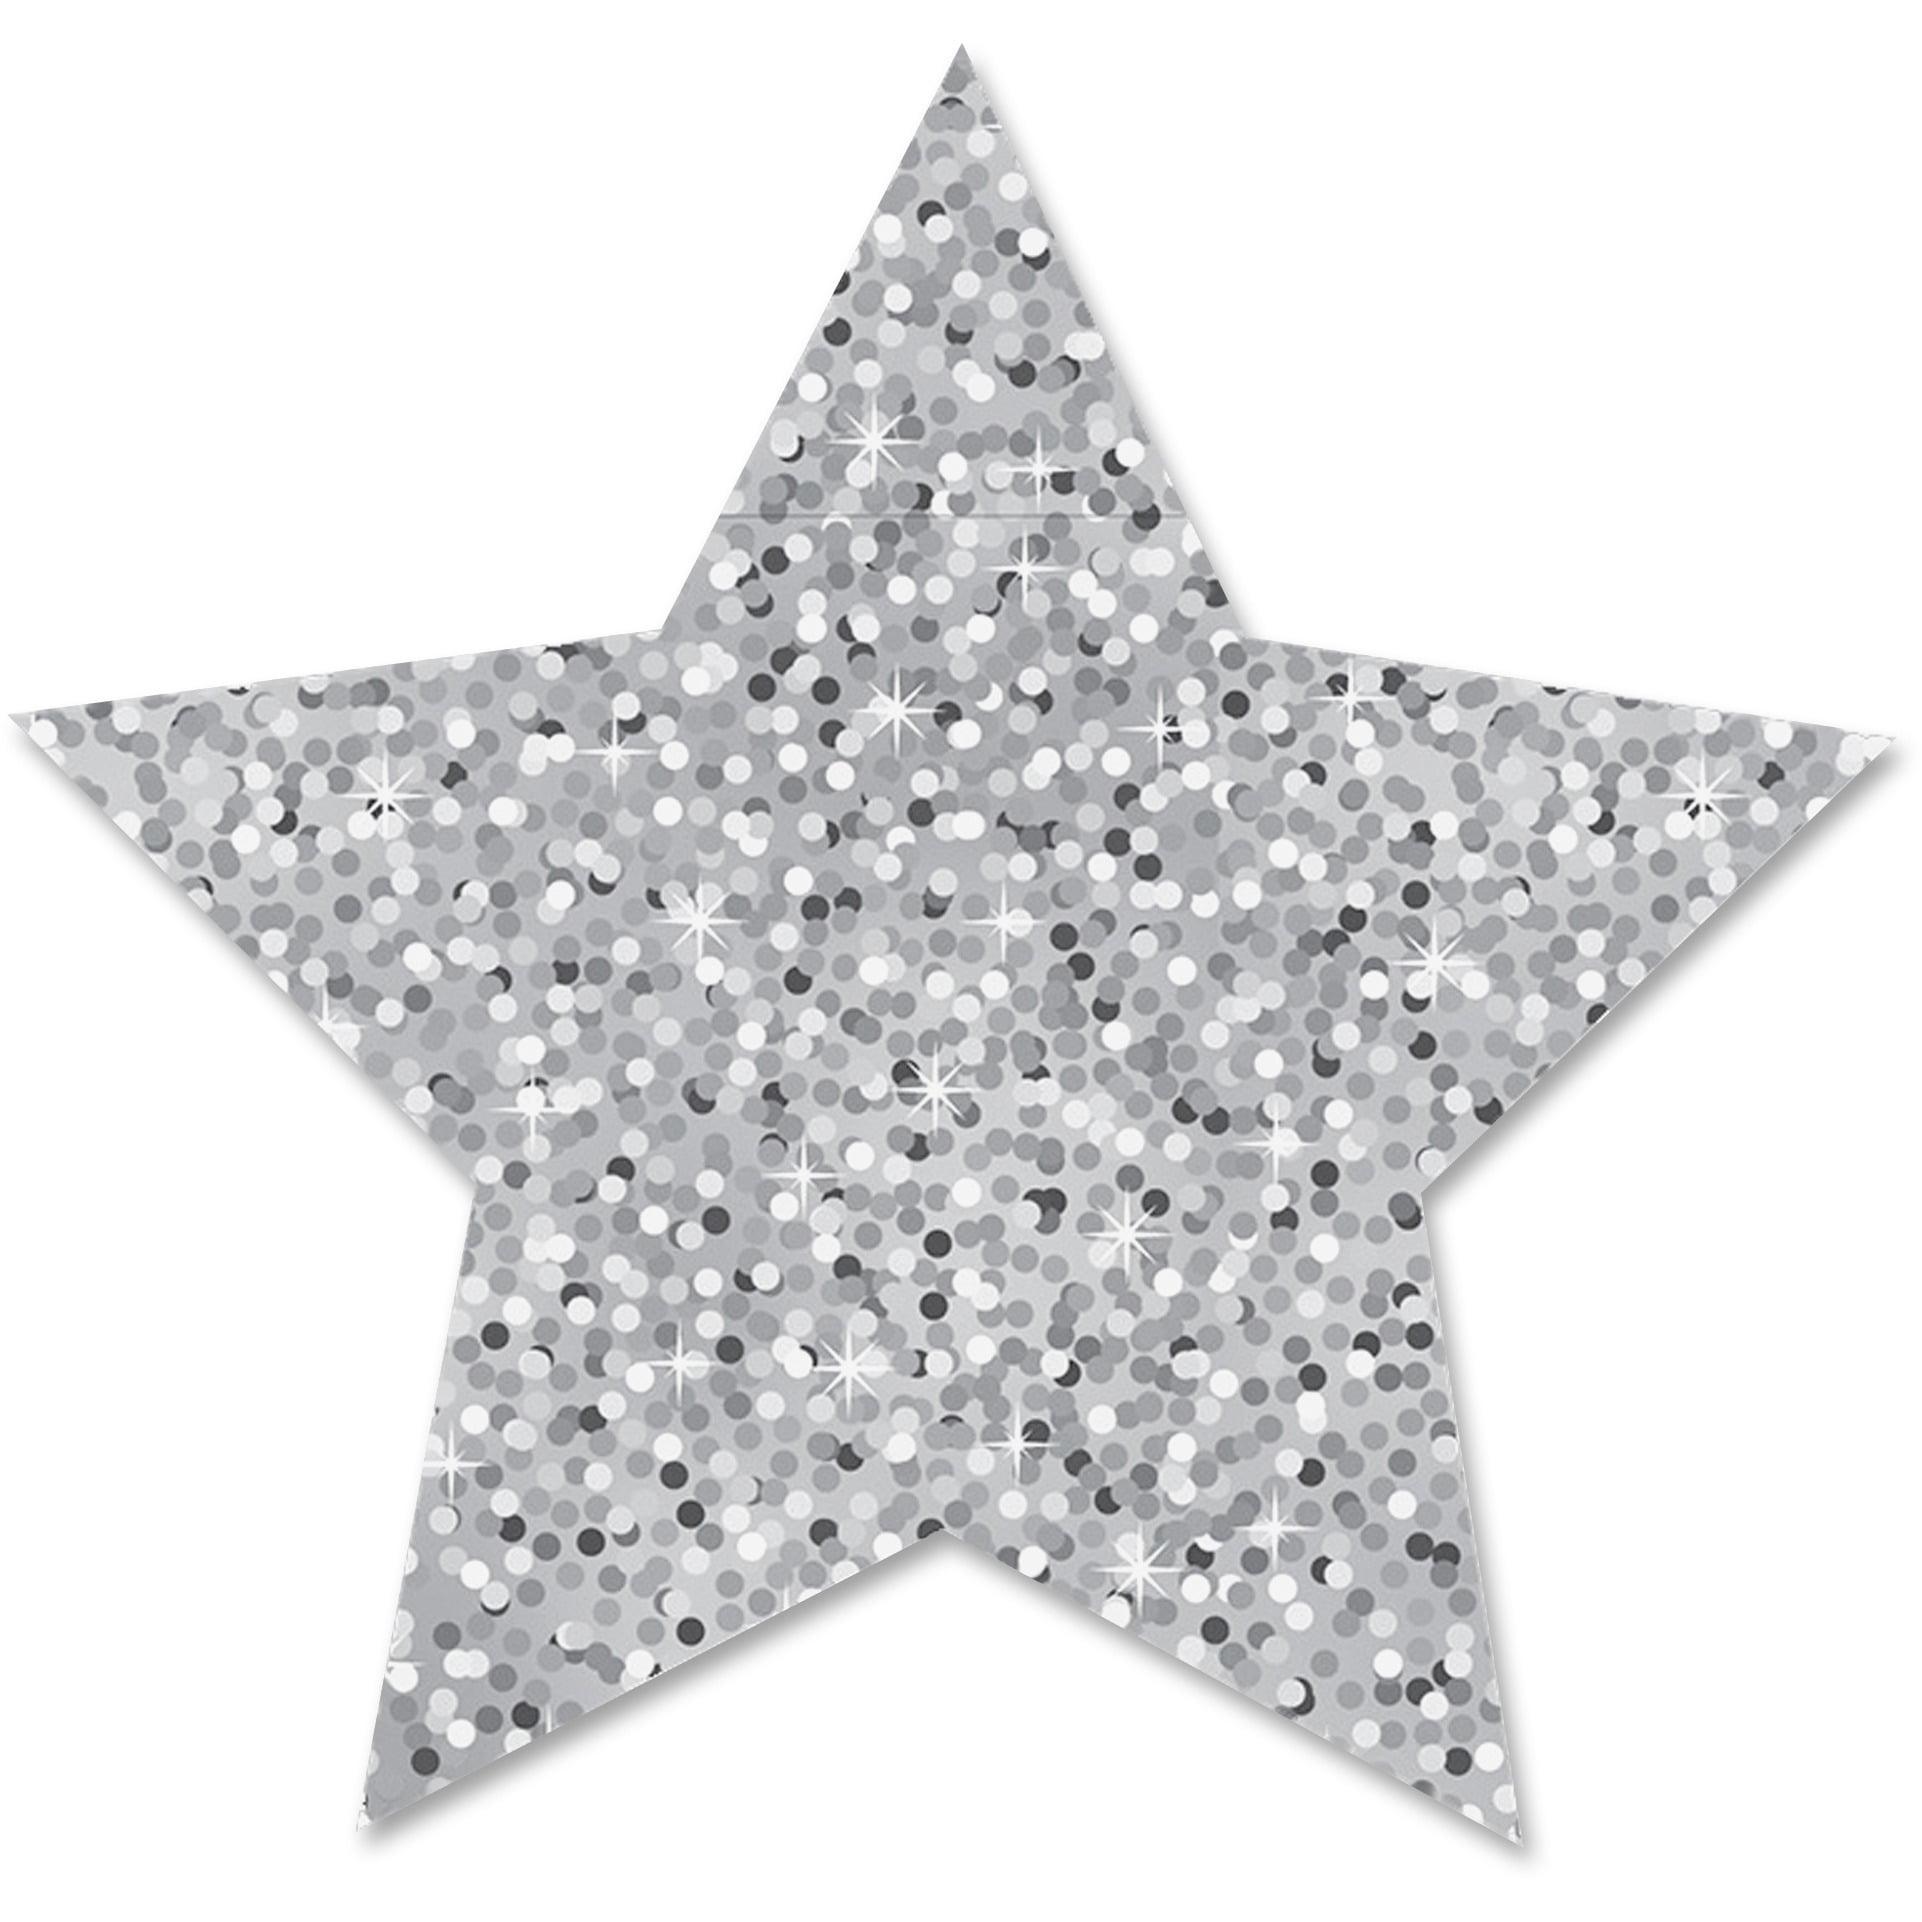 Ashley, ASH30451, Sparkle Decorative Magnetic Star, 6 / Set, Silver